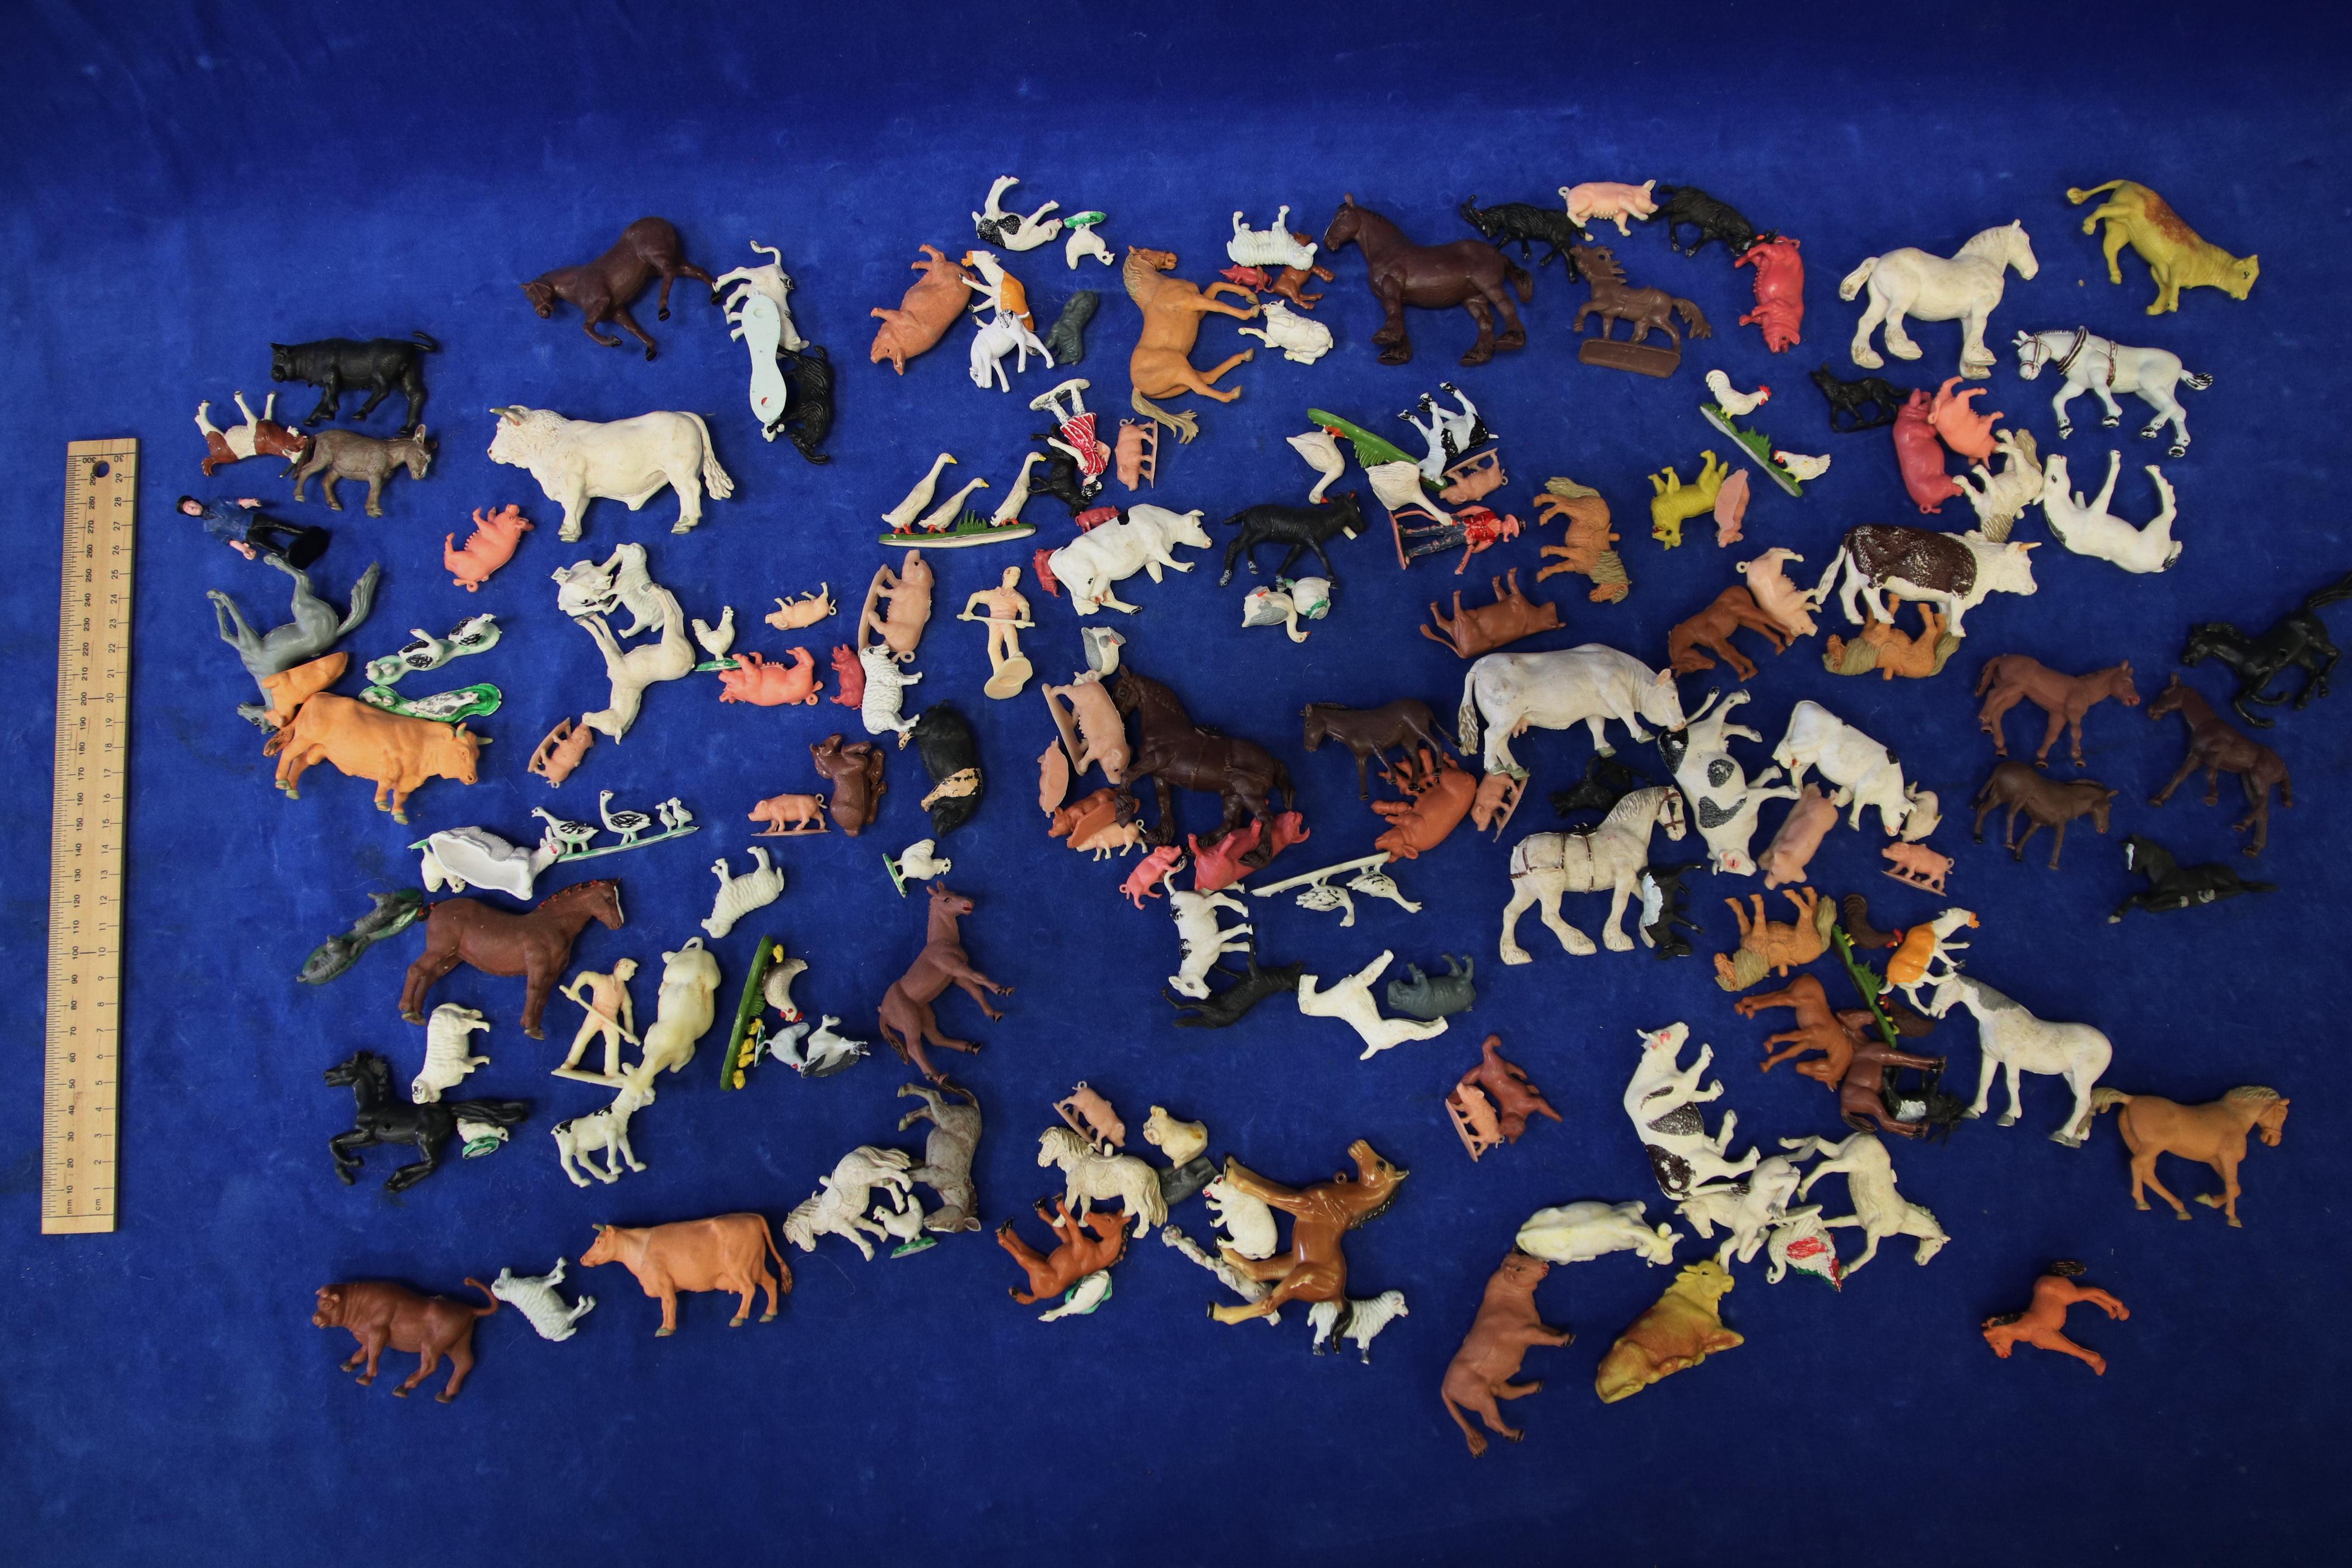 157 MISC FARM ANIMAL FIGURES